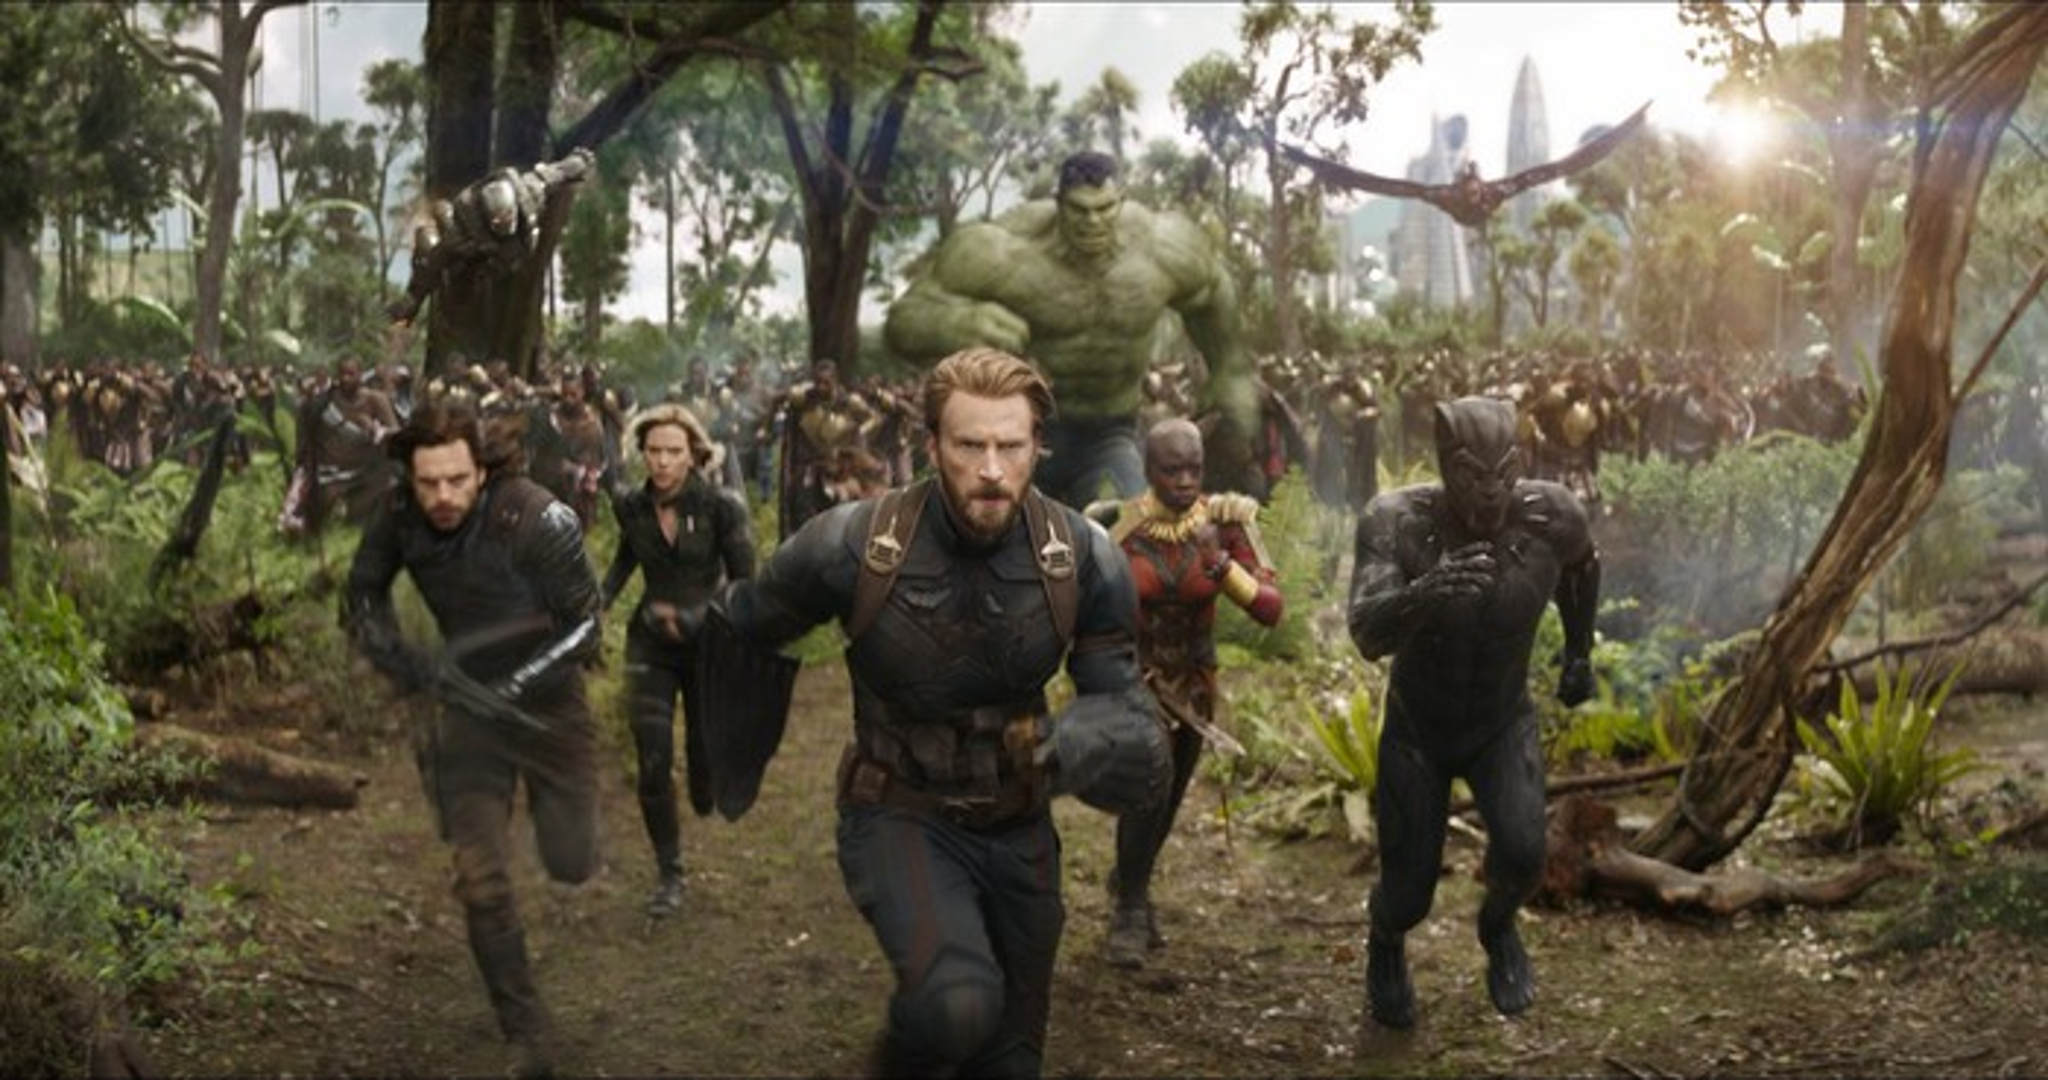 The Avengers, led by Captain America, run toward an unseen foe.